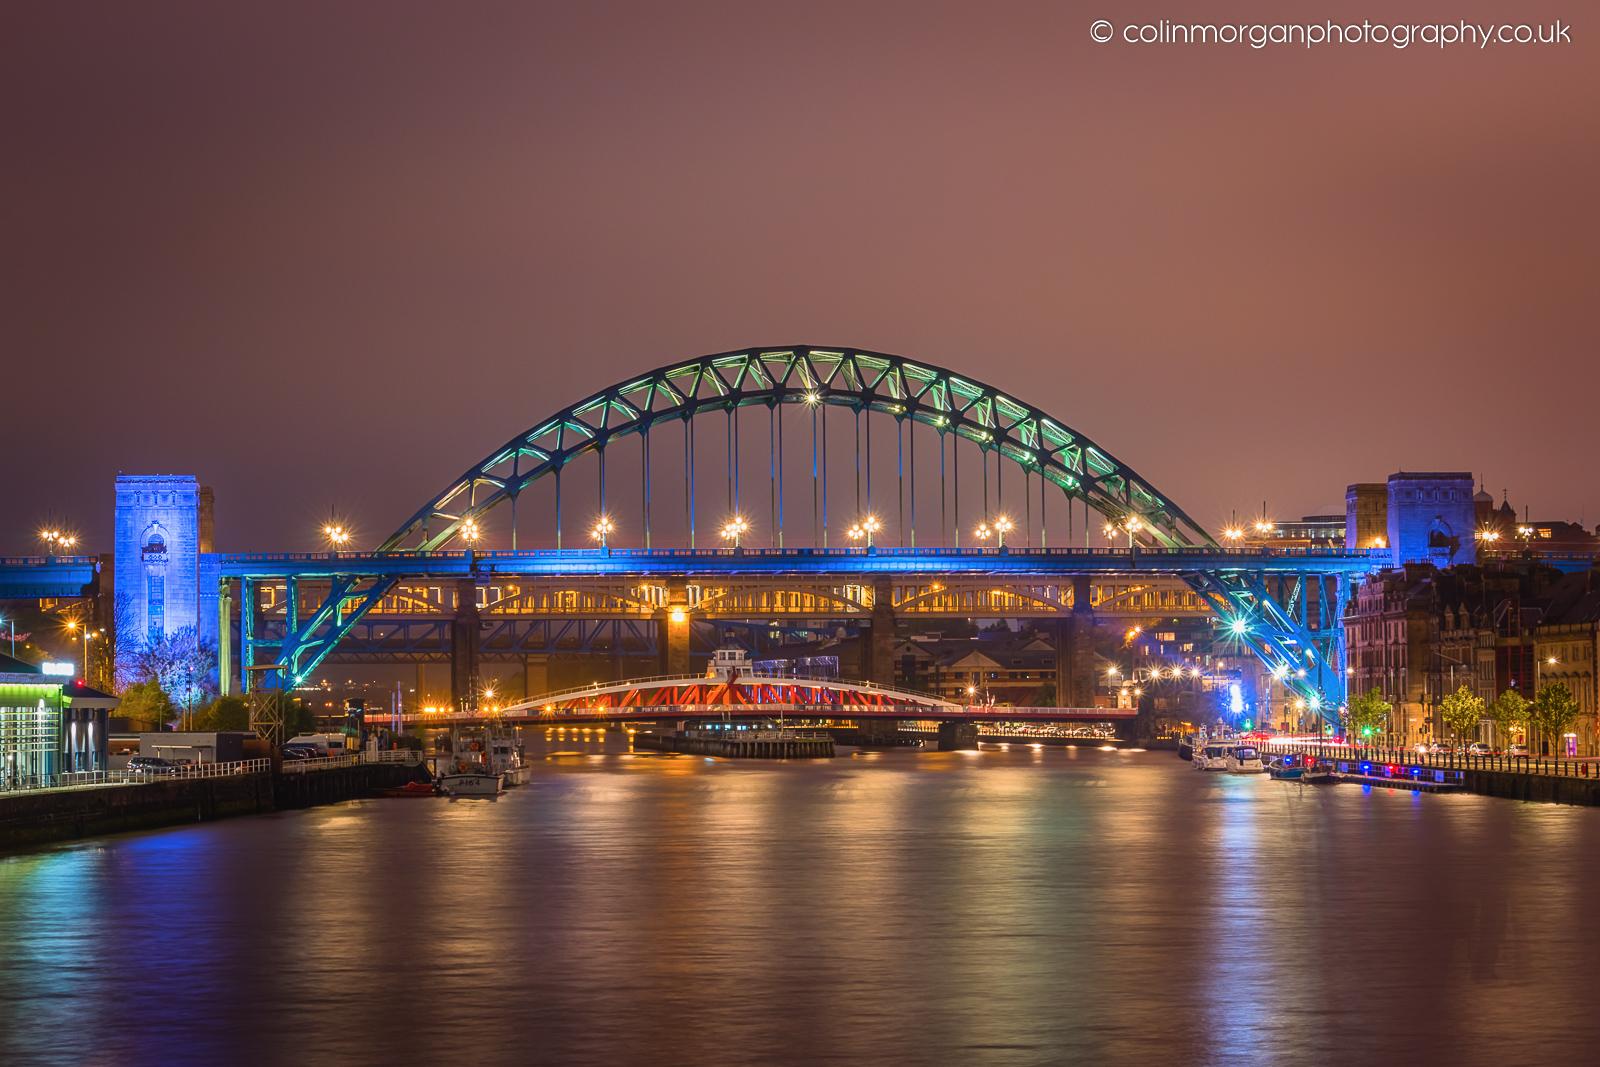 Tyne Bridges at Night from the Millennium Bridge. Colin Morgan Photography